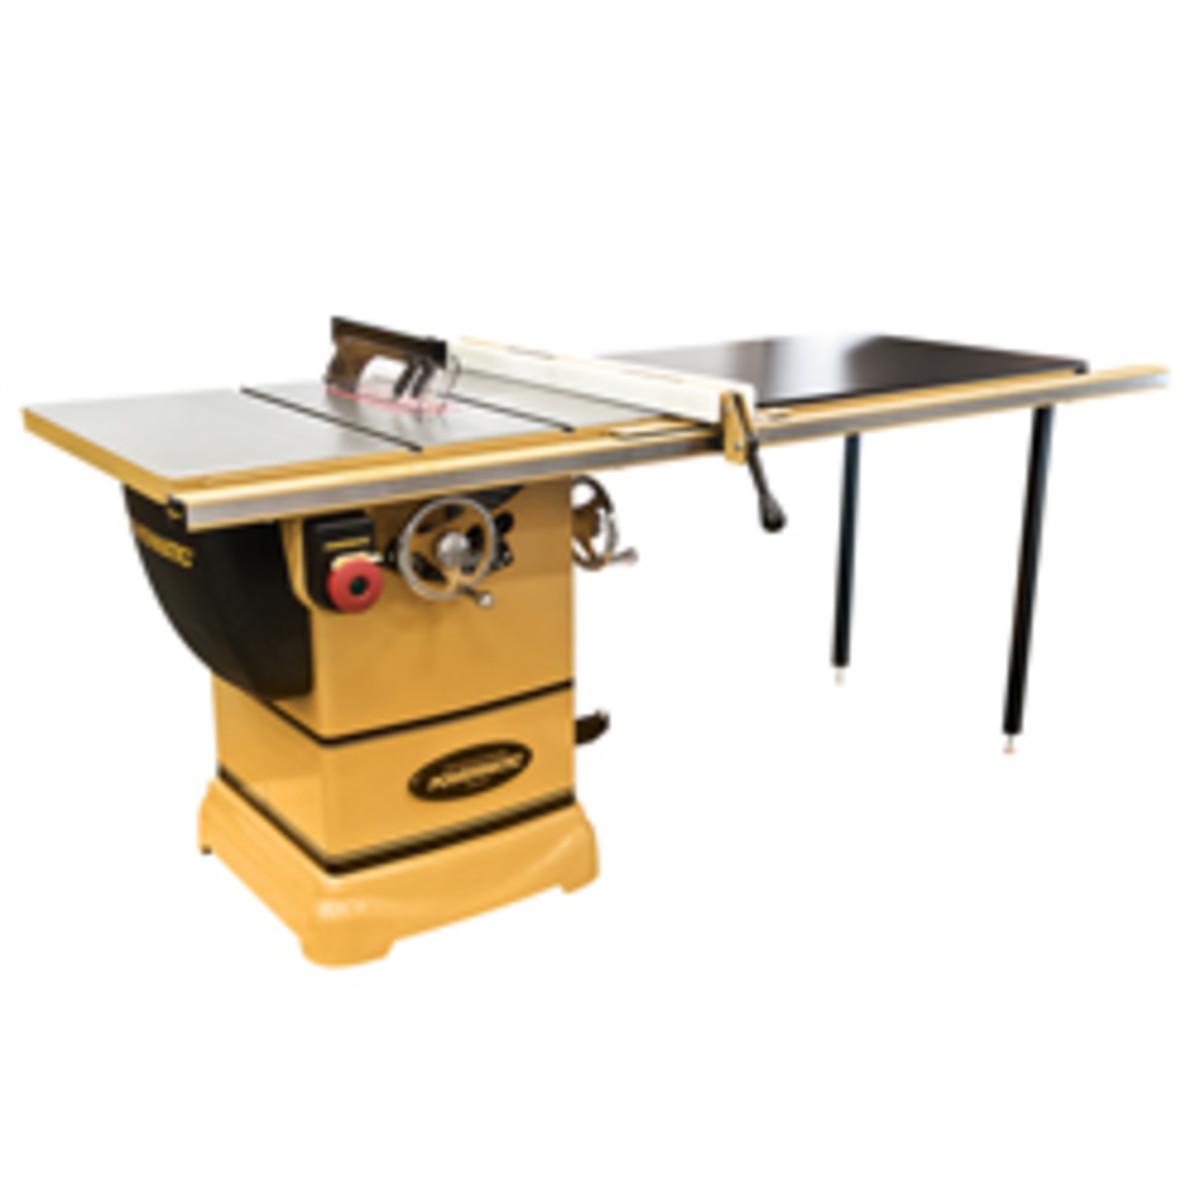 Powermatic's PM1000 table saw.